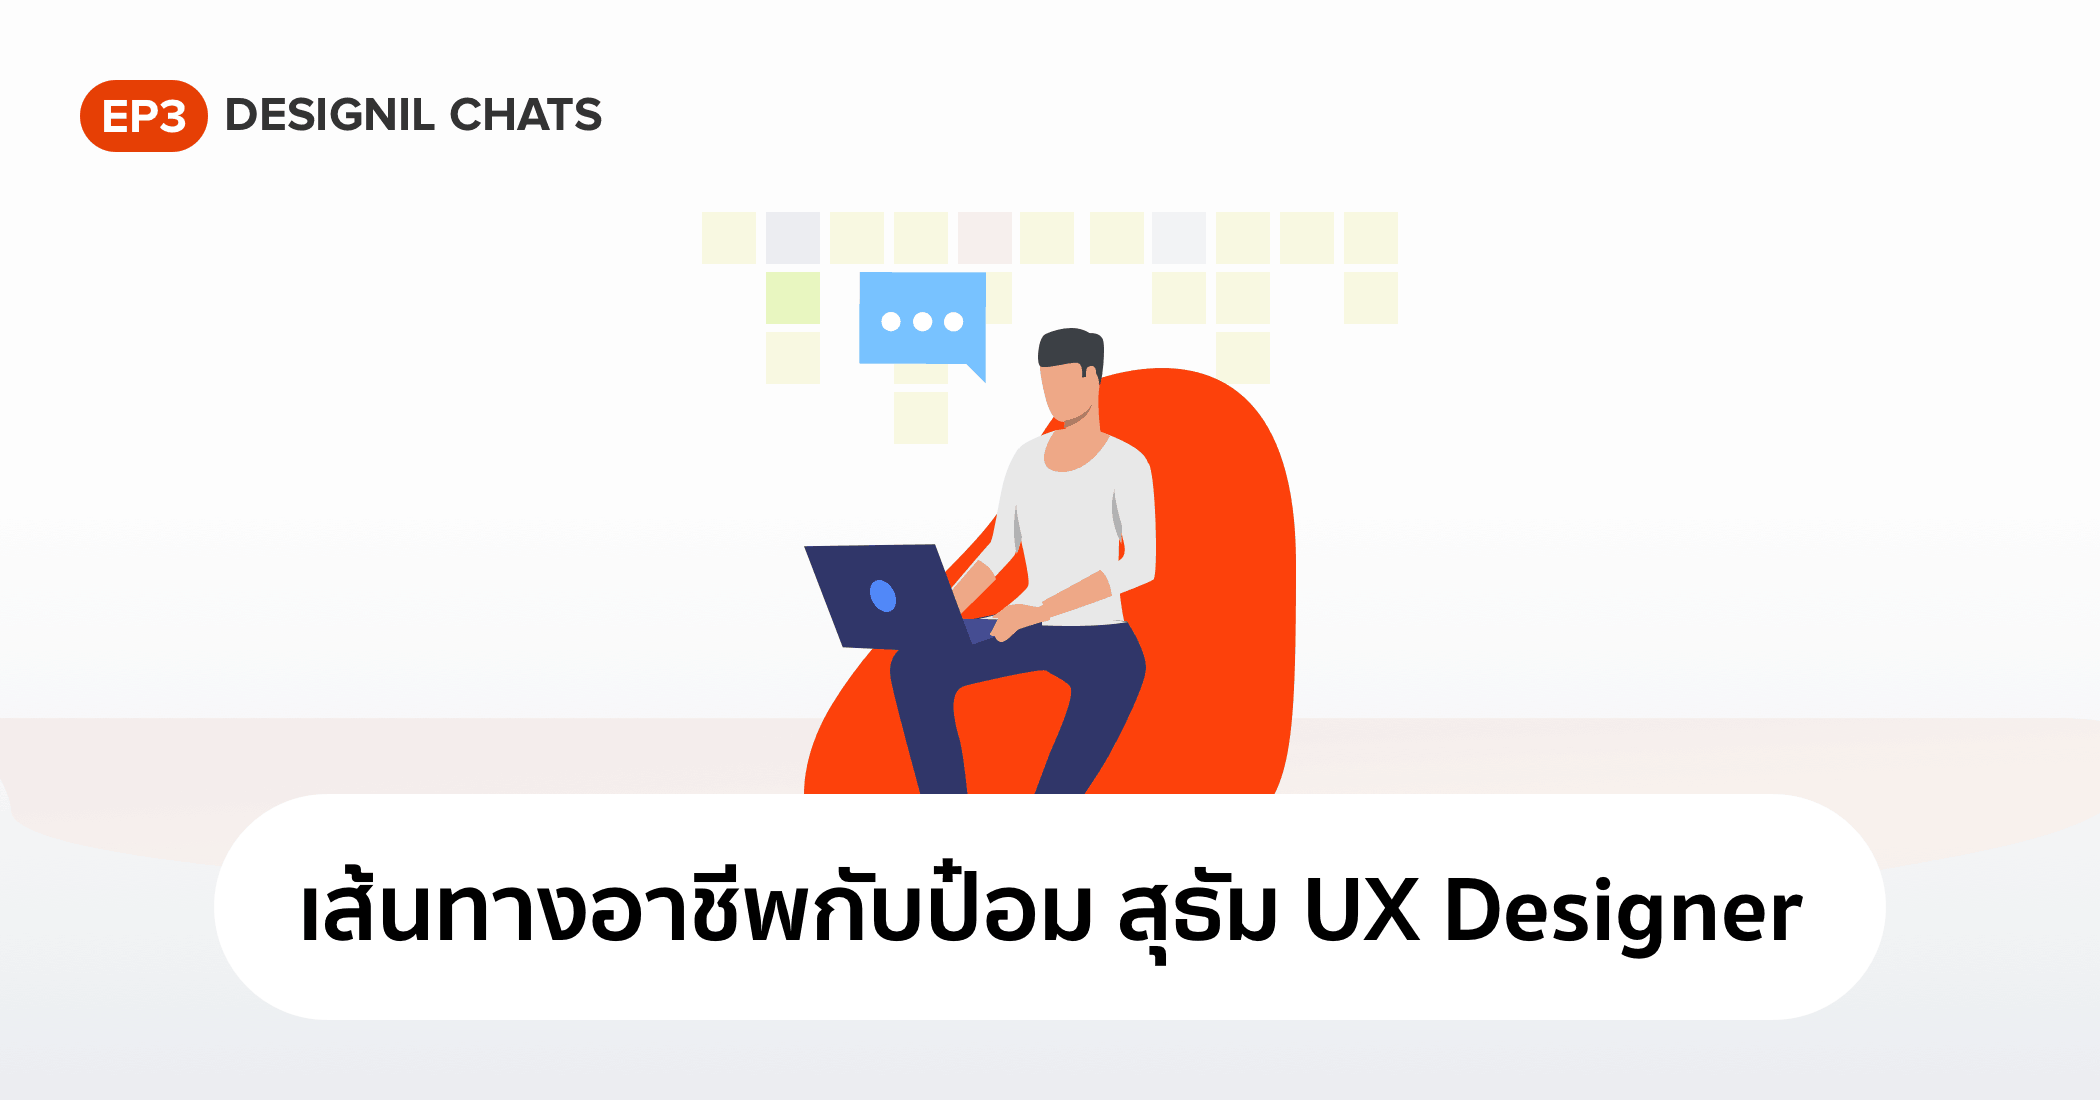 designil chats ep3